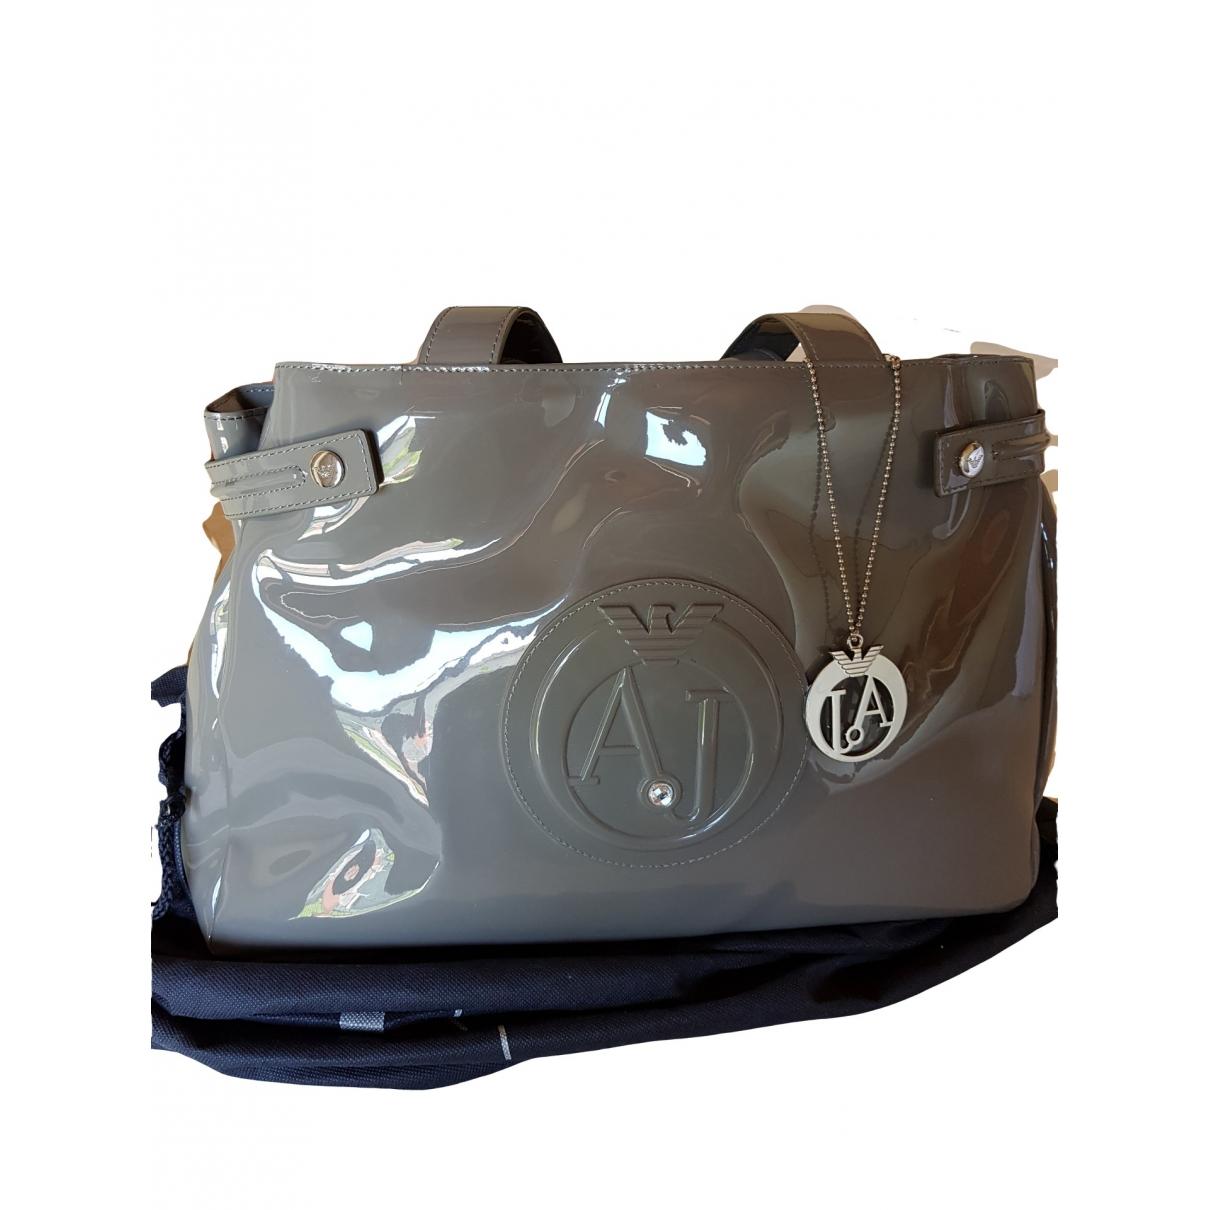 Armani Jeans \N Grey Patent leather handbag for Women \N